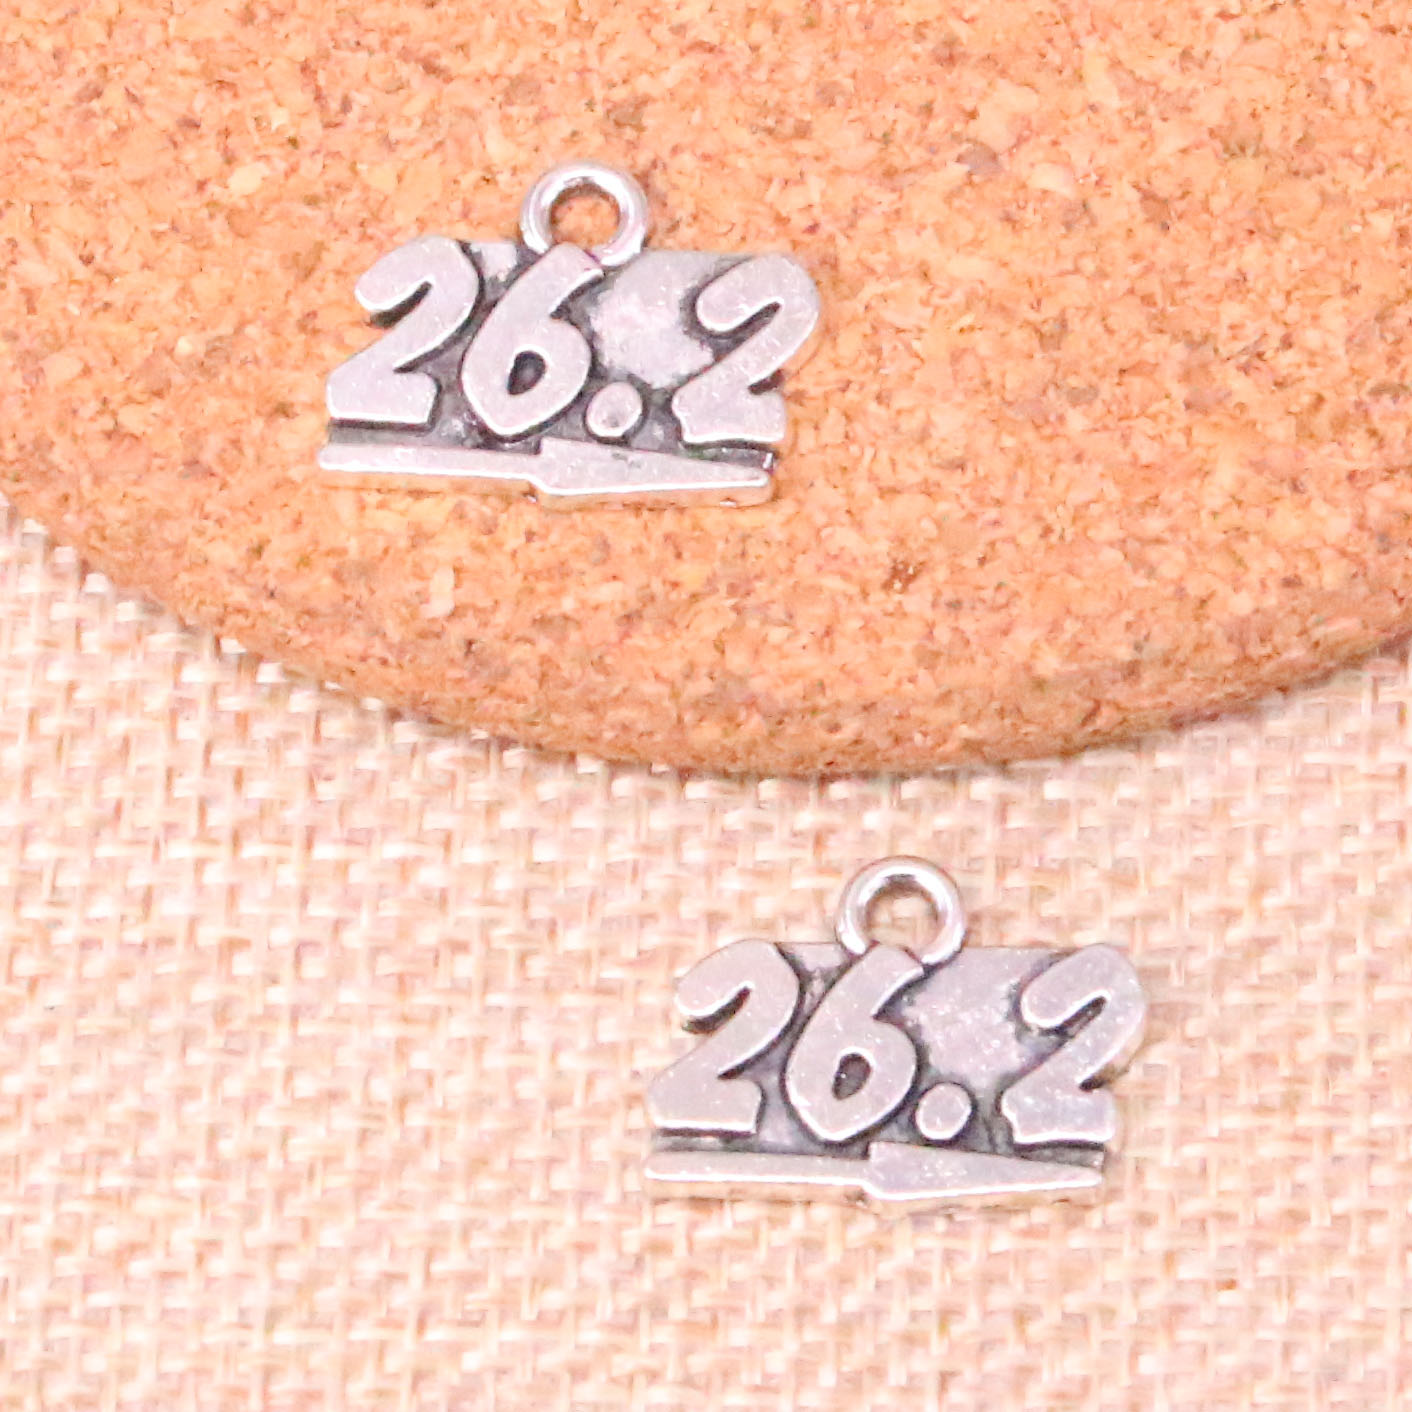 20pcs Tibetan Silver Plated 26.2 marathon Charms Pendants for Jewelry Making DIY Handmade Craft 20*15mm